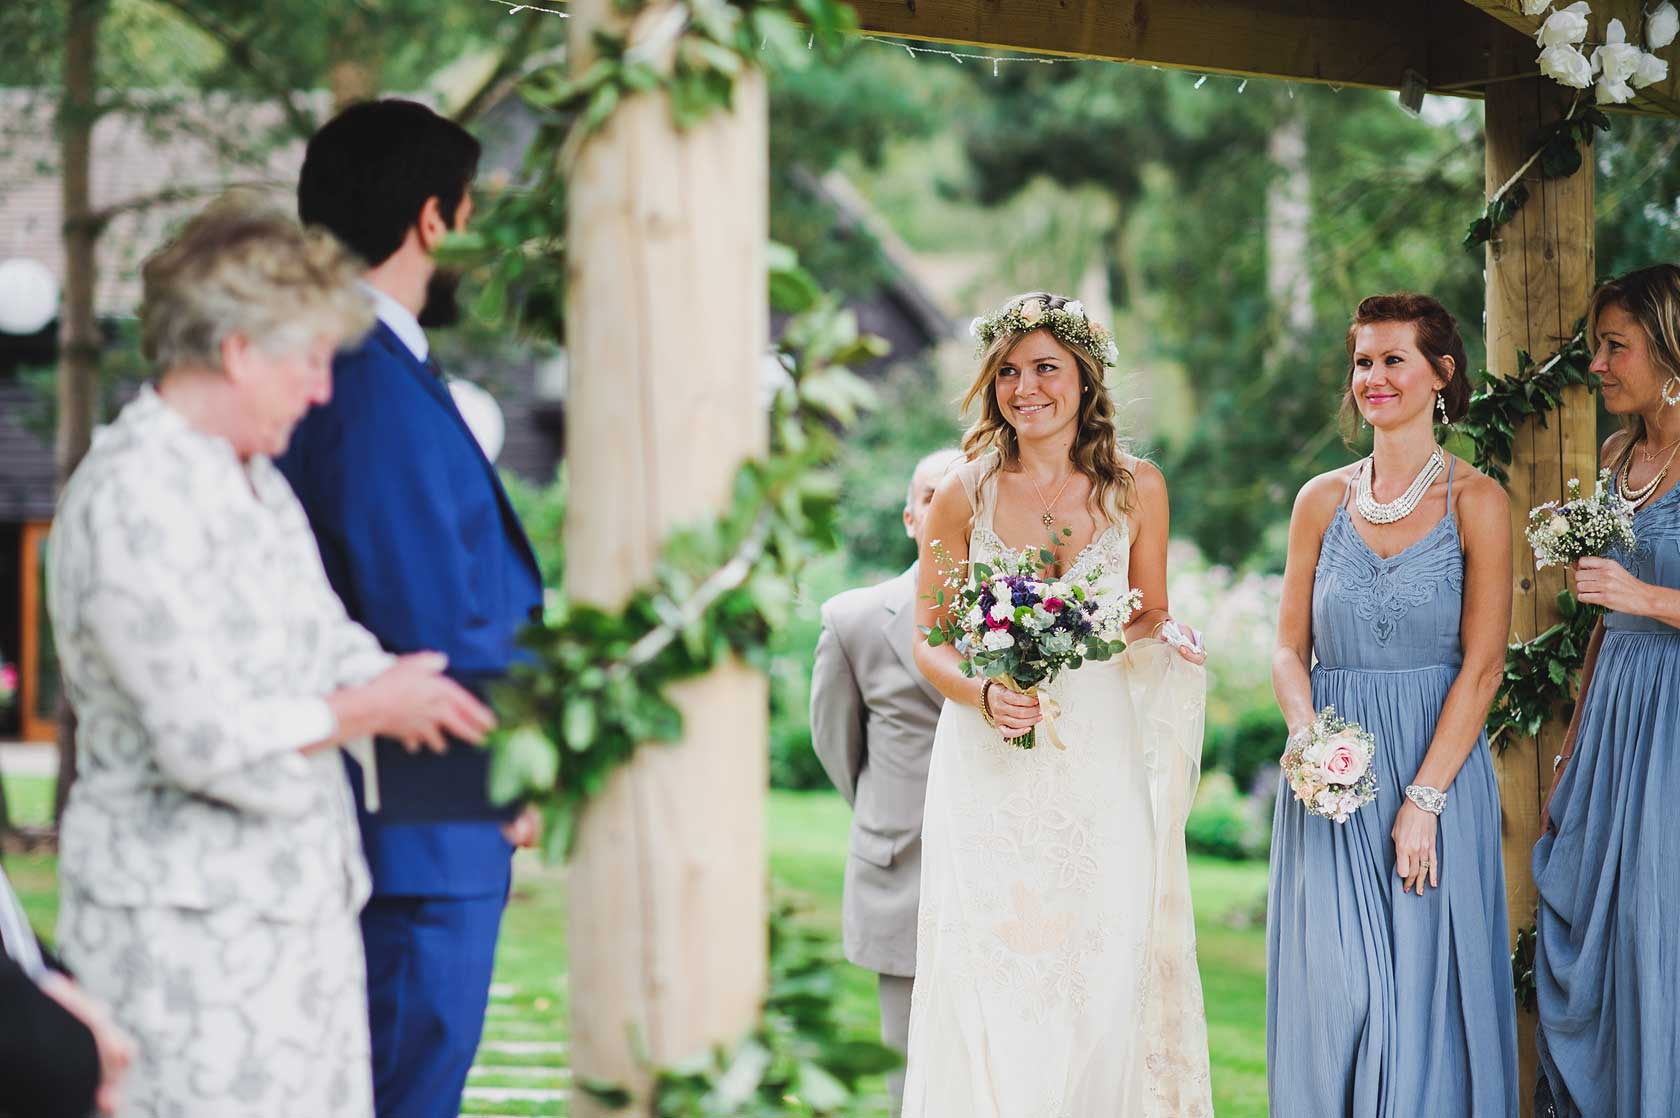 Wedding Photographer in Shropshire